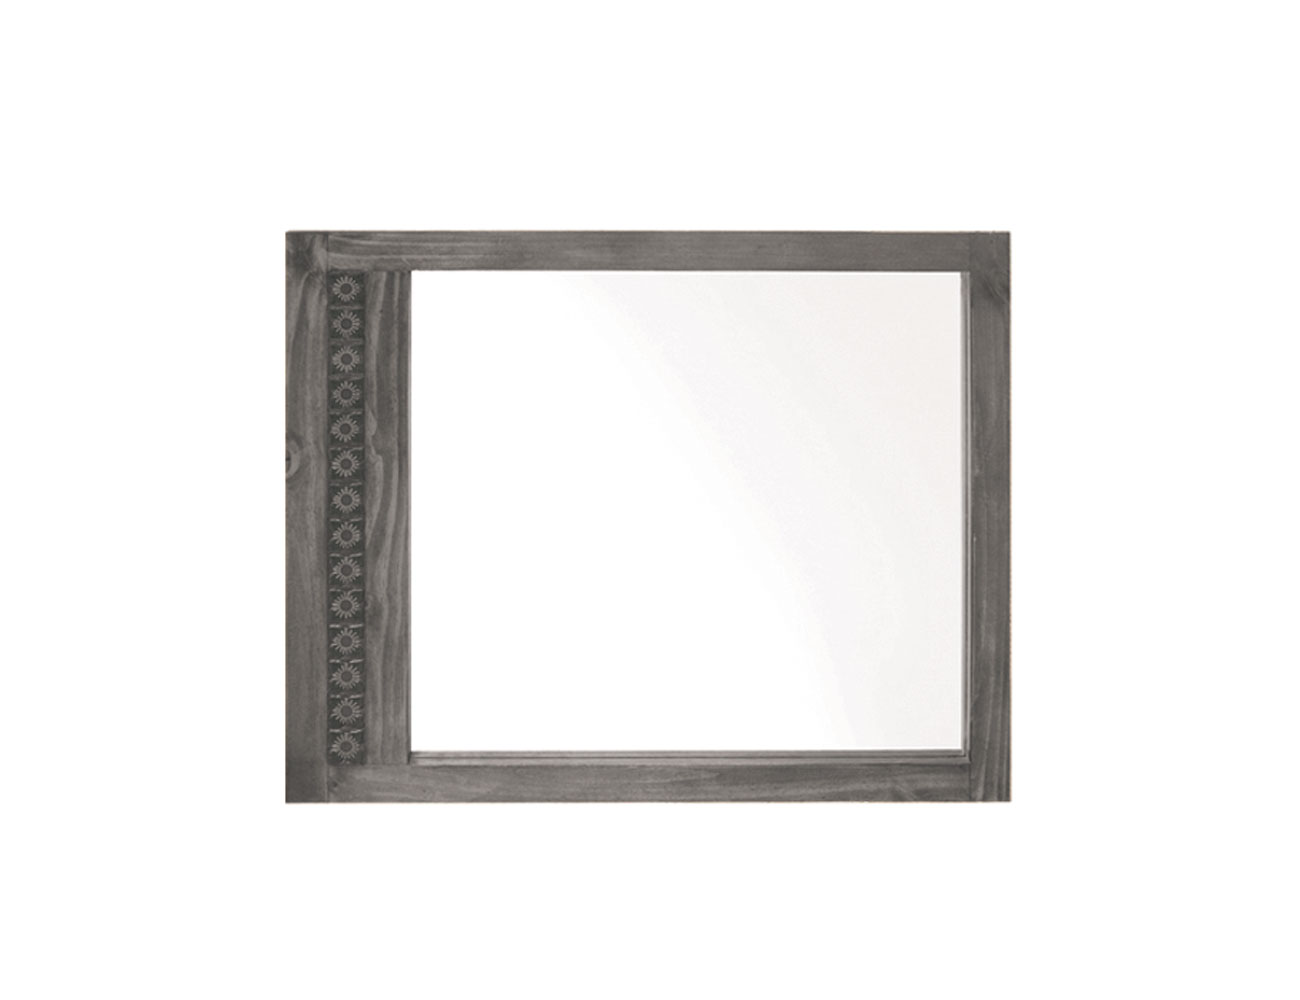 1920702 marco espejo taxco girasol madera 100 80